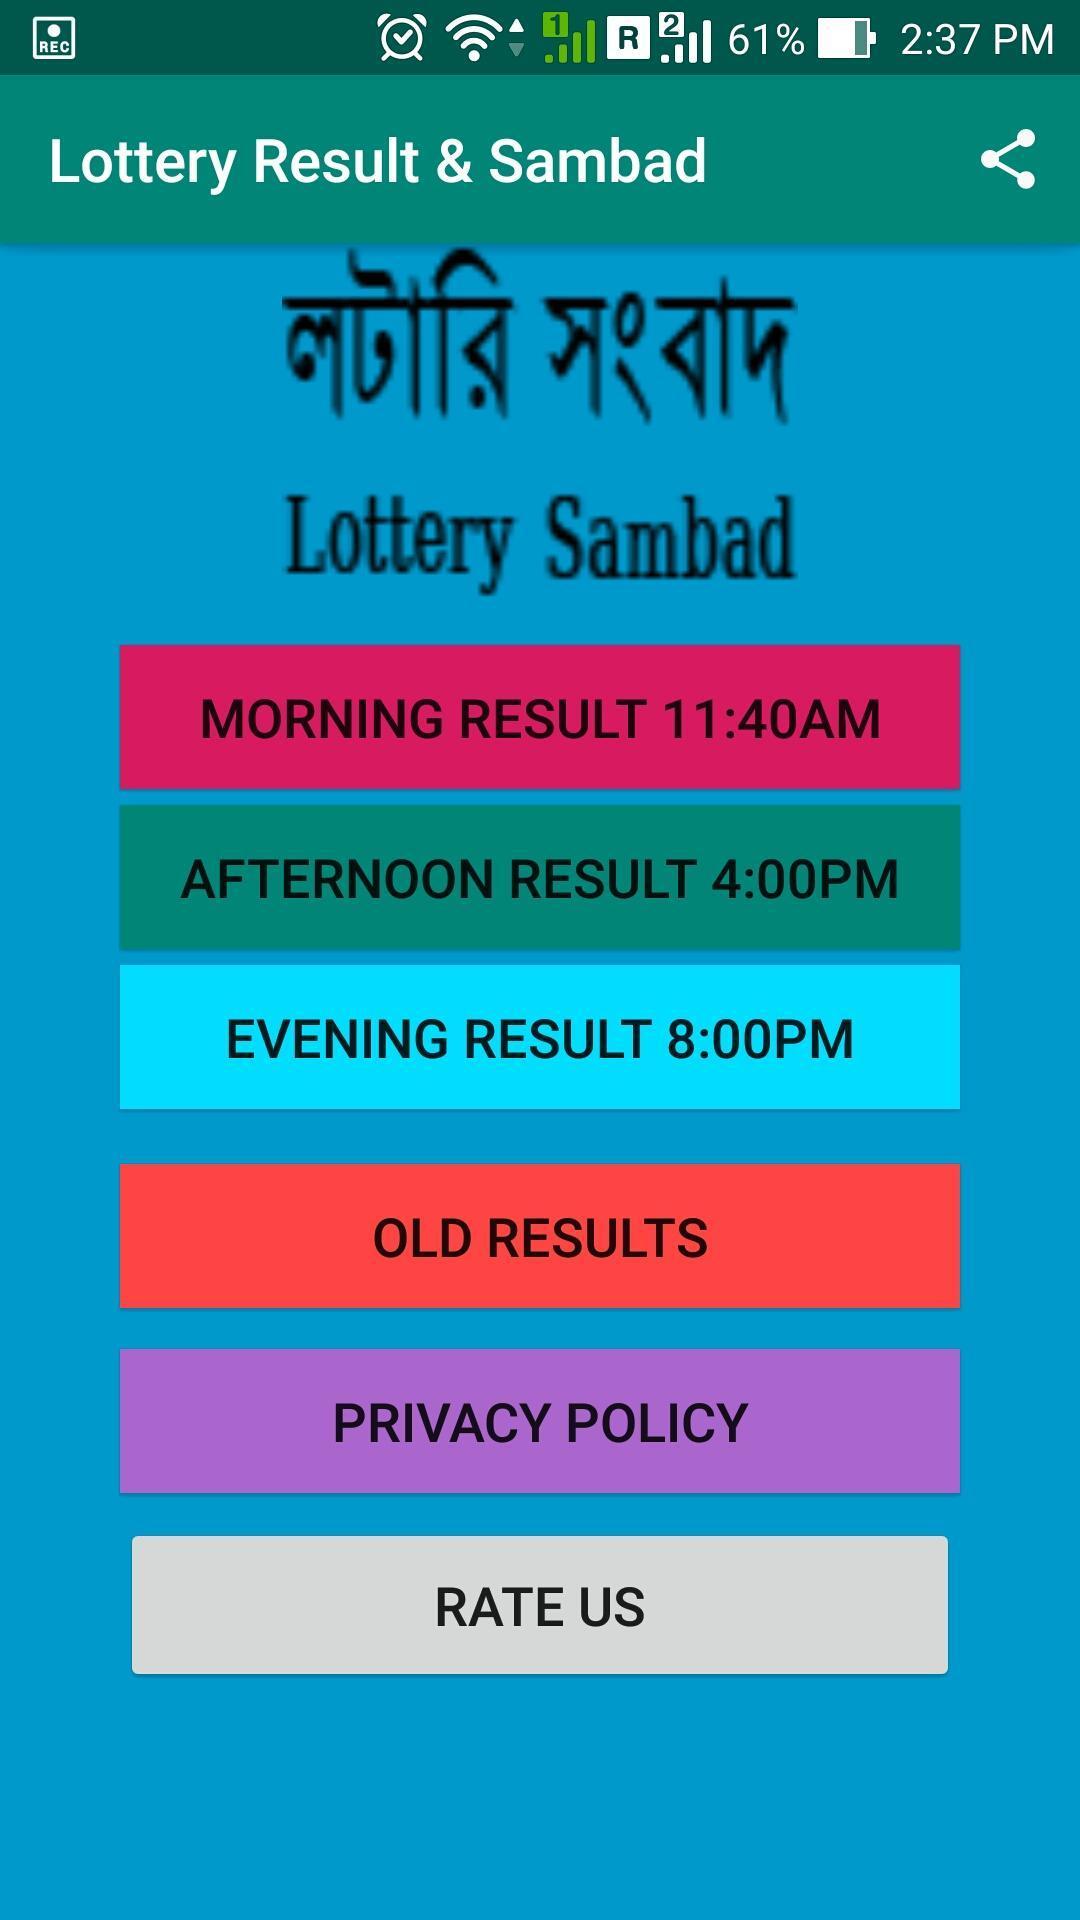 Lottery Sambad Old